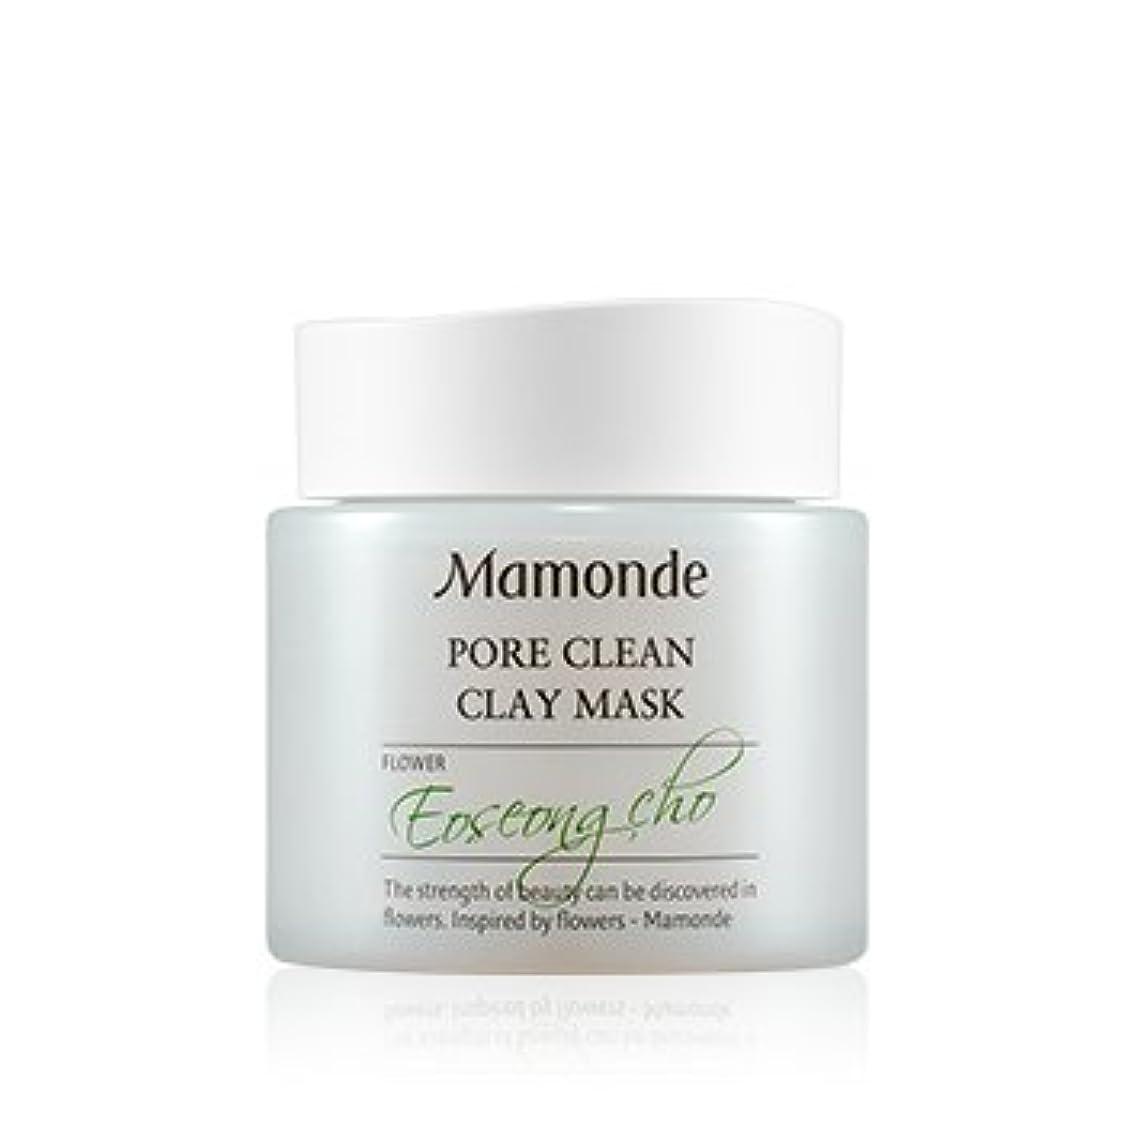 [New] Mamonde Pore Clean Clay Mask 100ml/マモンド ポア クリーン クレイ マスク 100ml [並行輸入品]